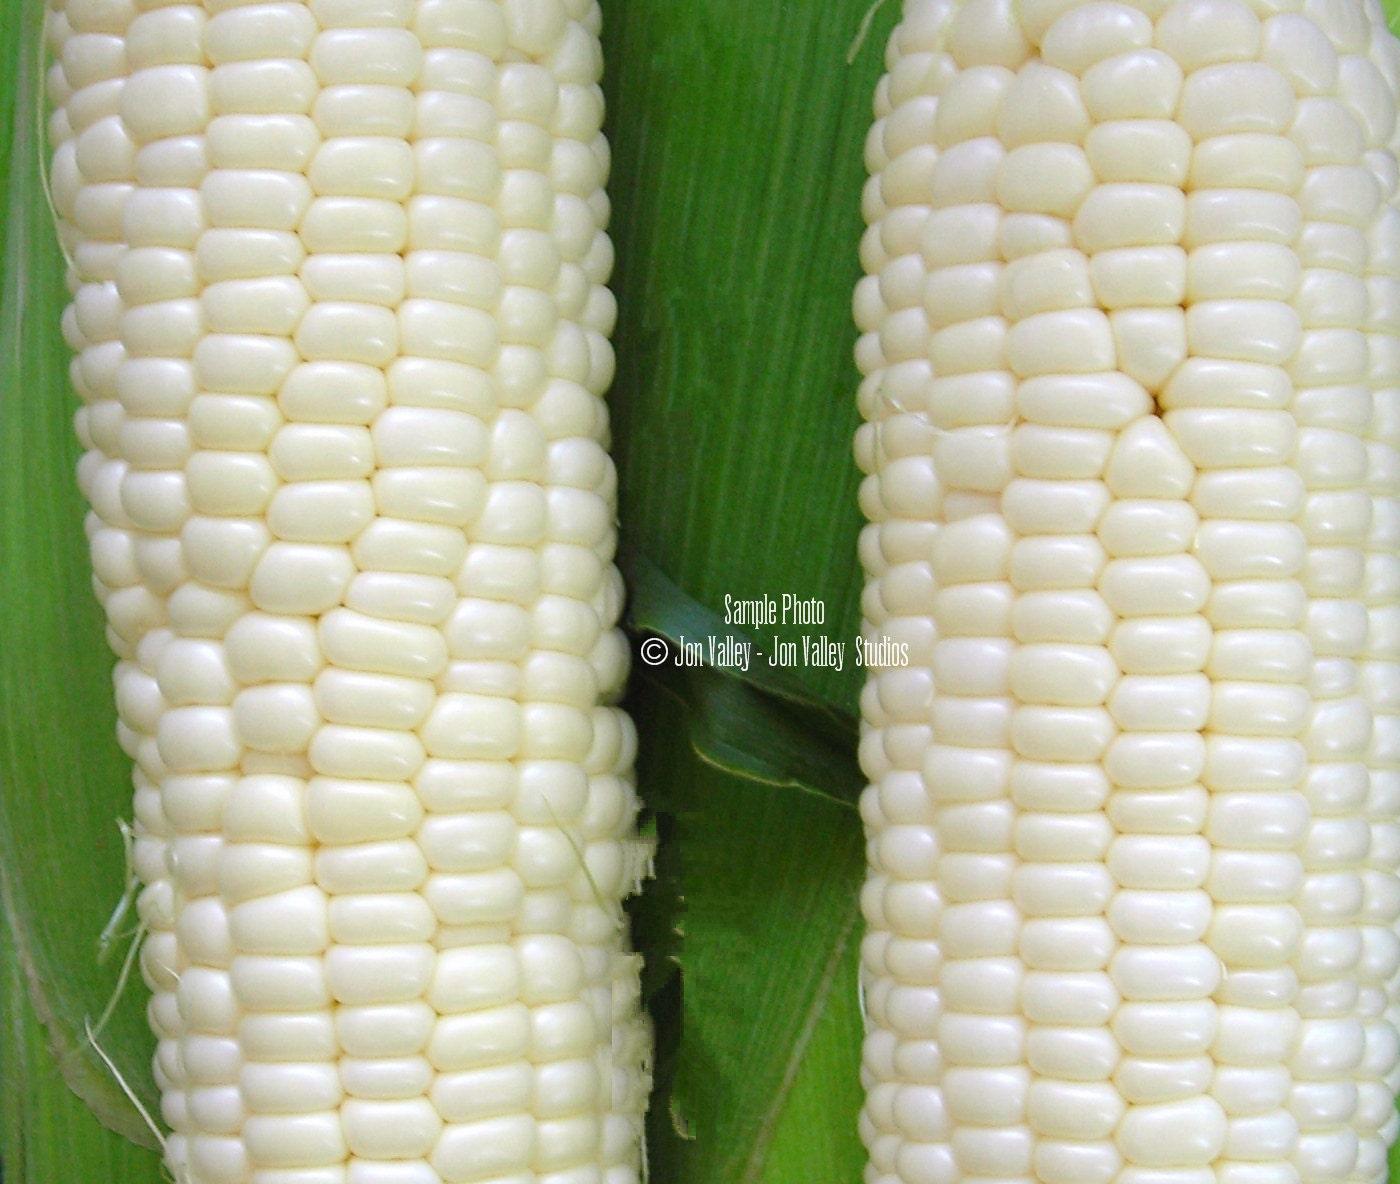 100 Hickory King White Corn Seeds 1800 Heirloom! Beautiful ...